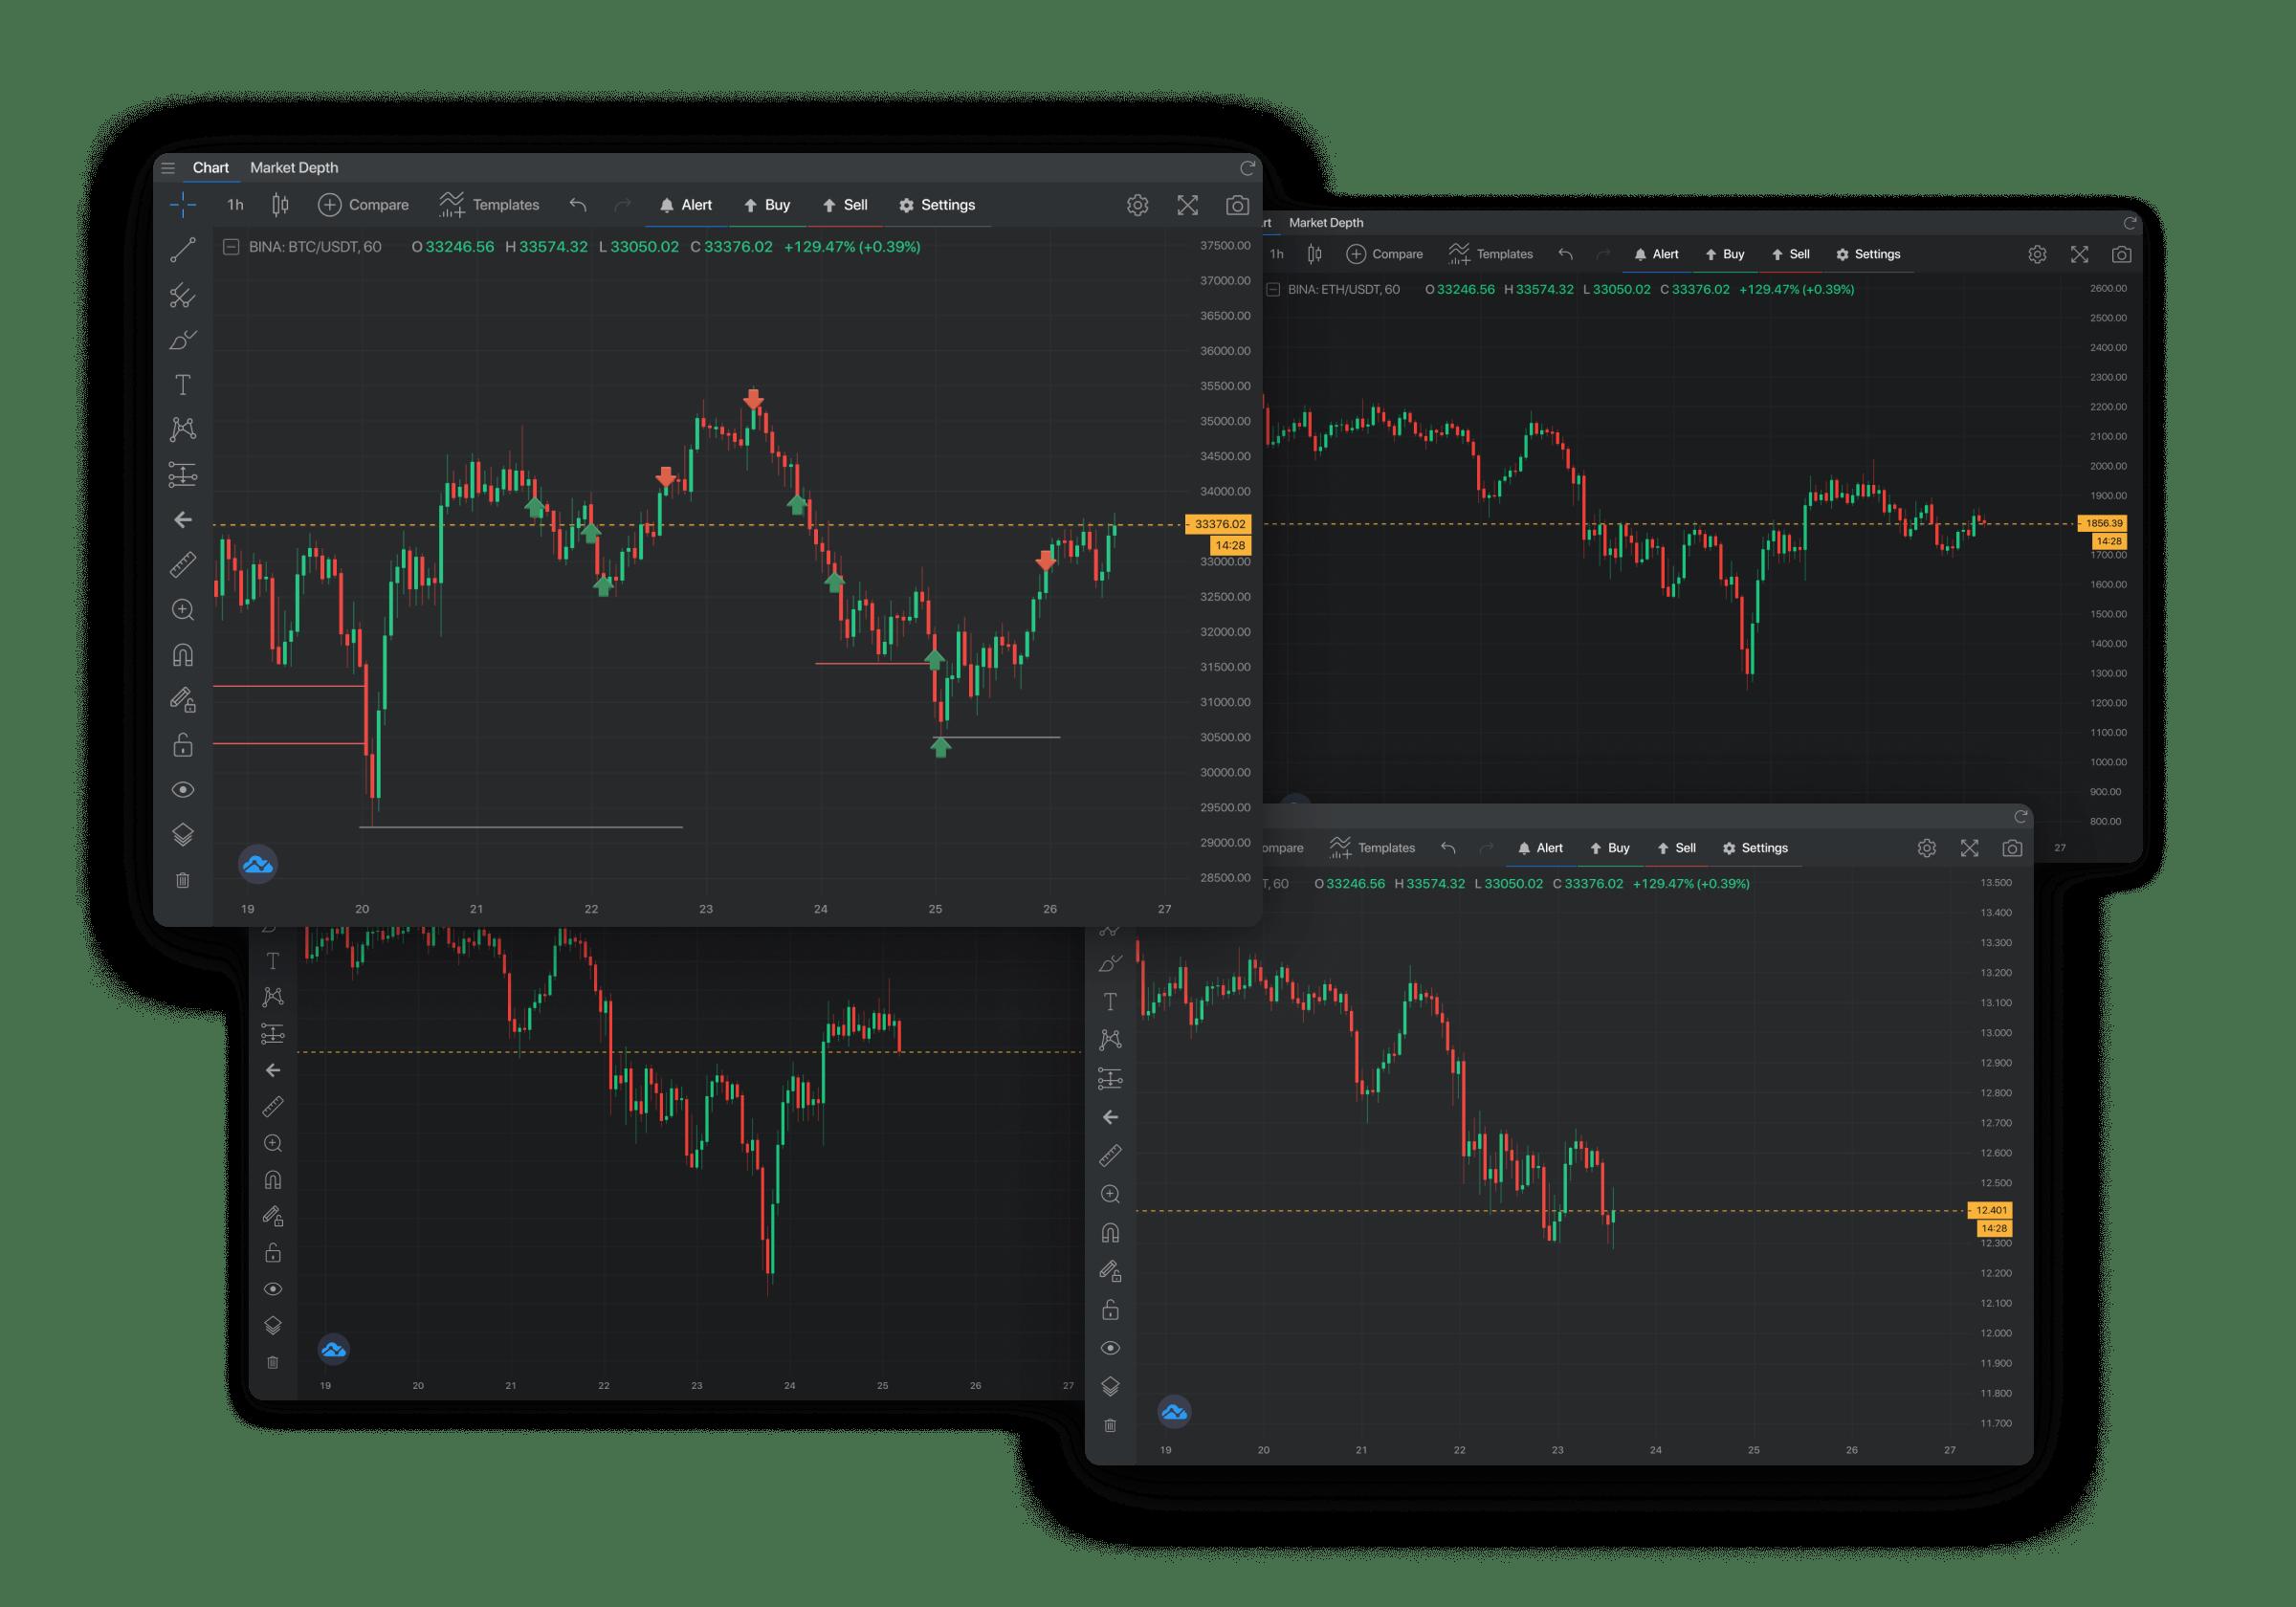 Multicharts